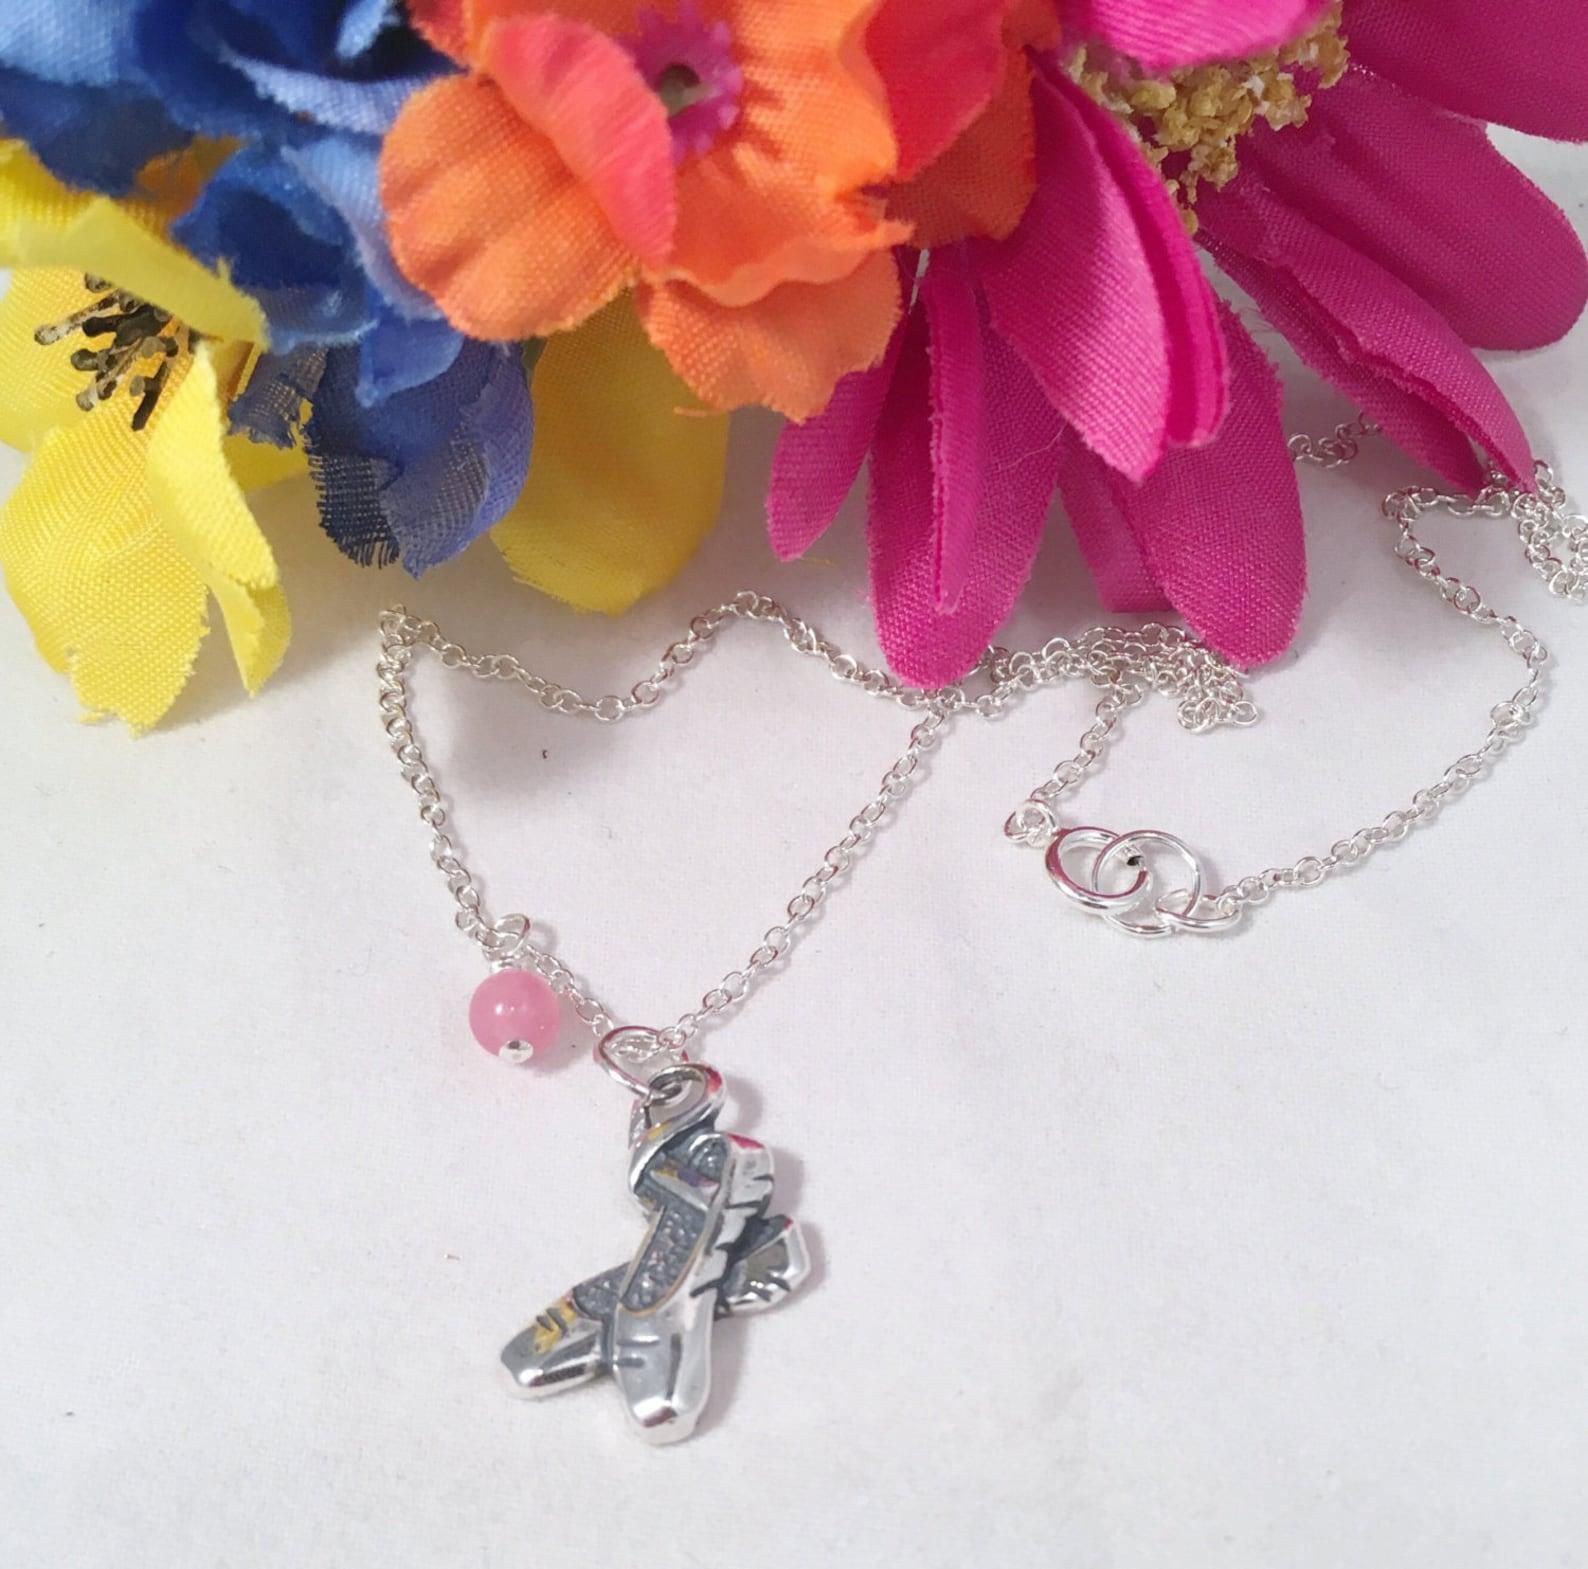 sterling ballet slipper necklace, dance recital gift, dance jewelry, dance teacher gift, sterling ballet point shoes necklace